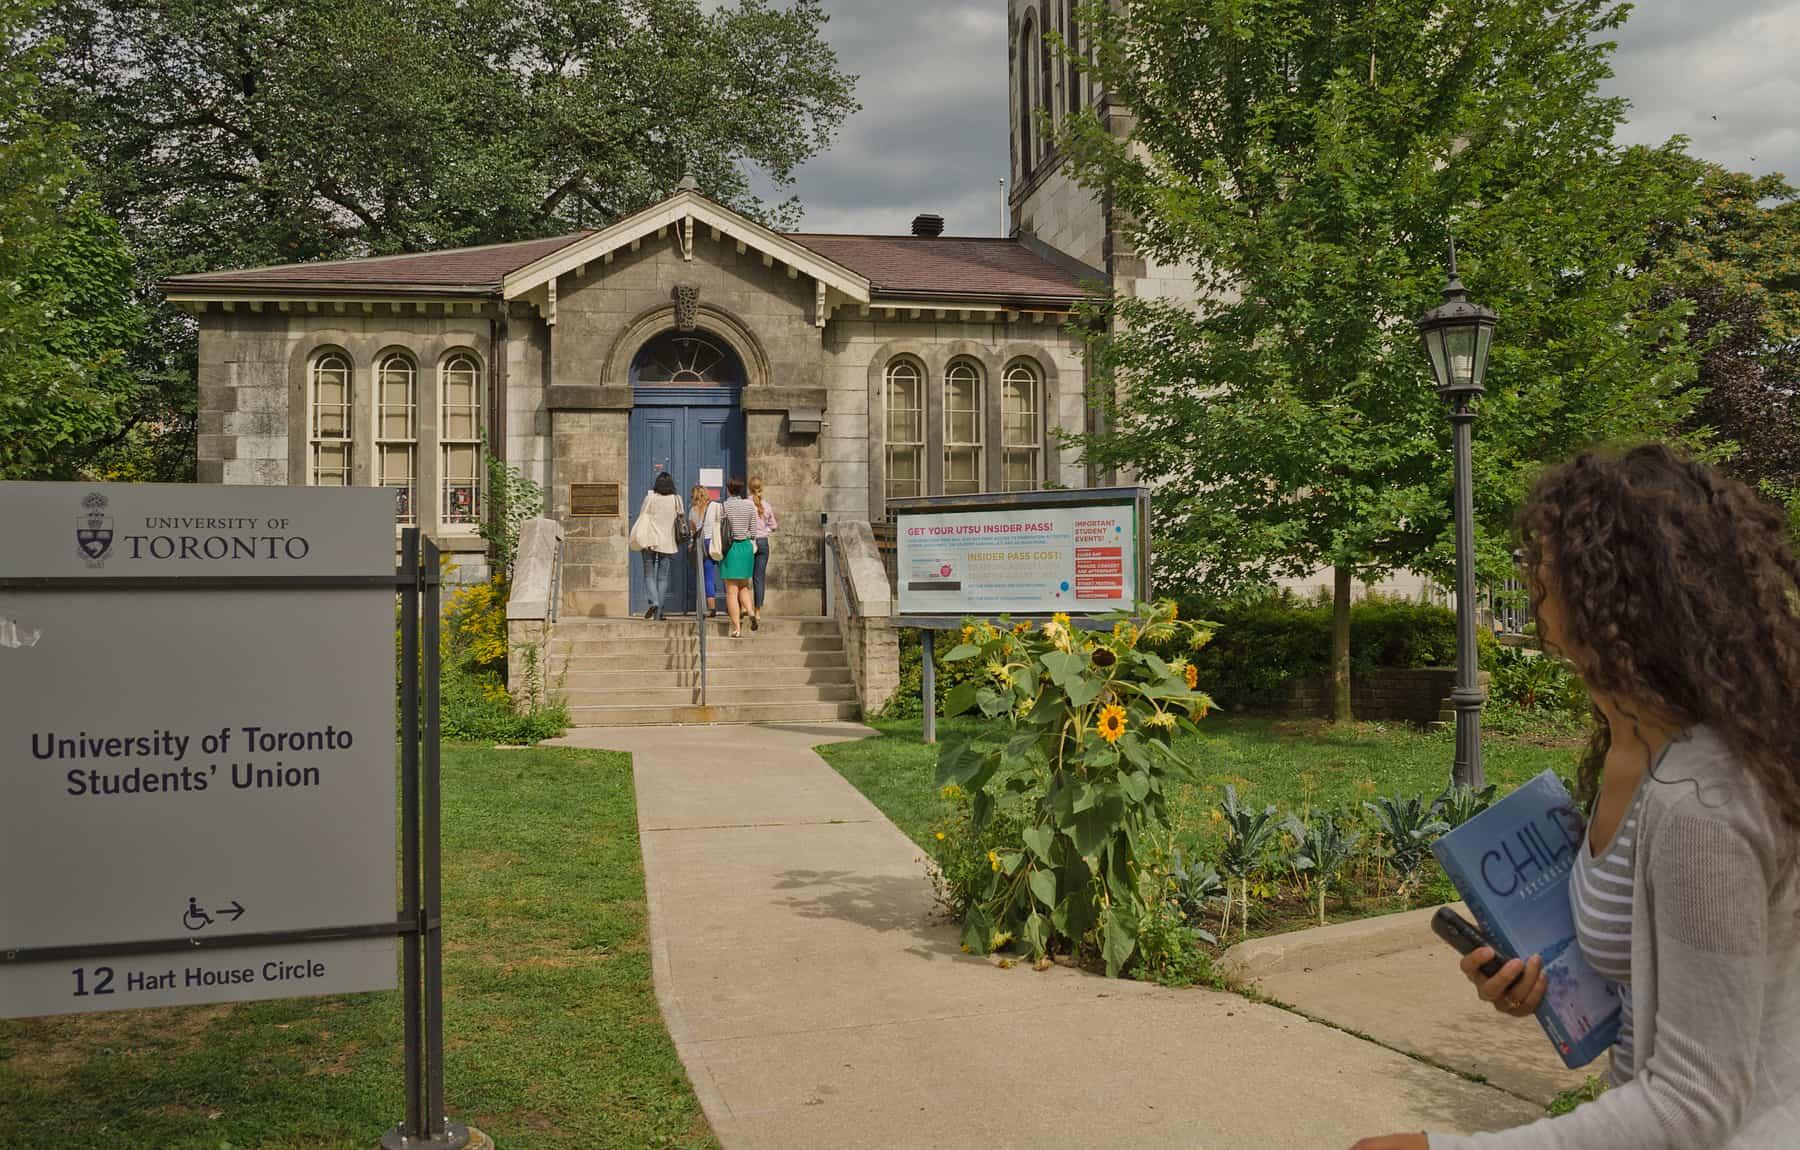 UTSU Insider Pass duplicates free discounts